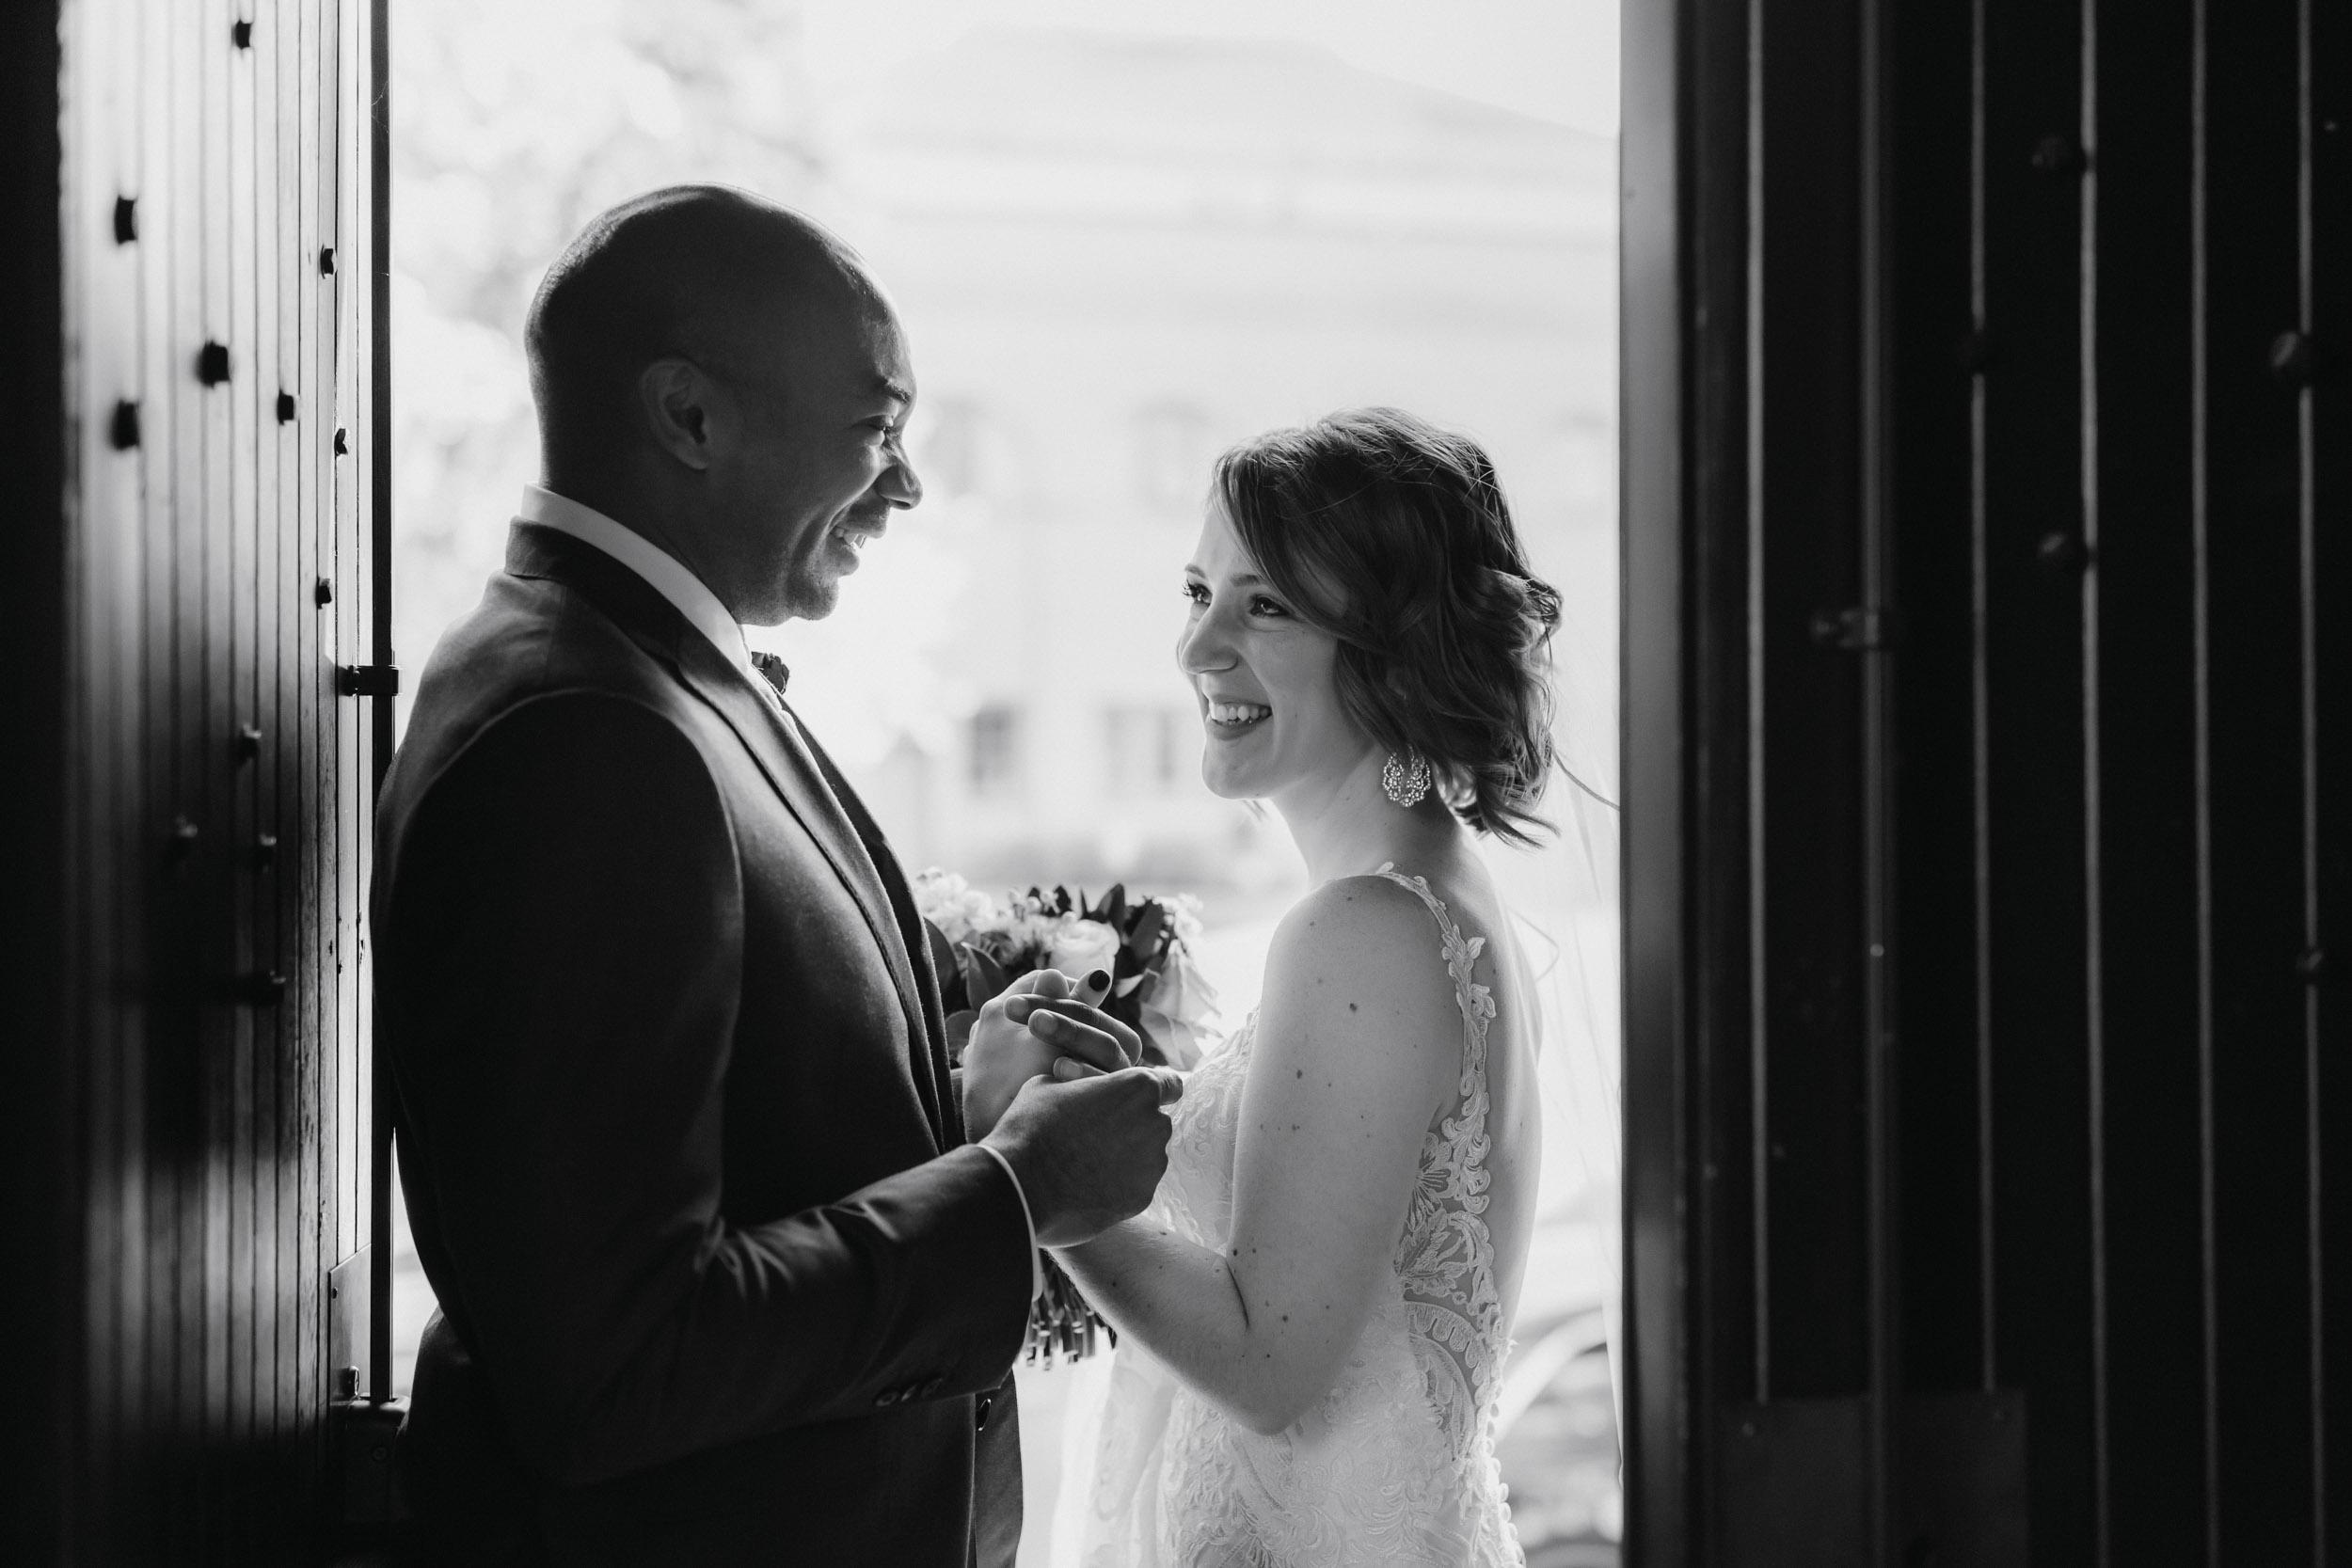 87-best minneapolis candid documentary wedding photographer-15.jpg